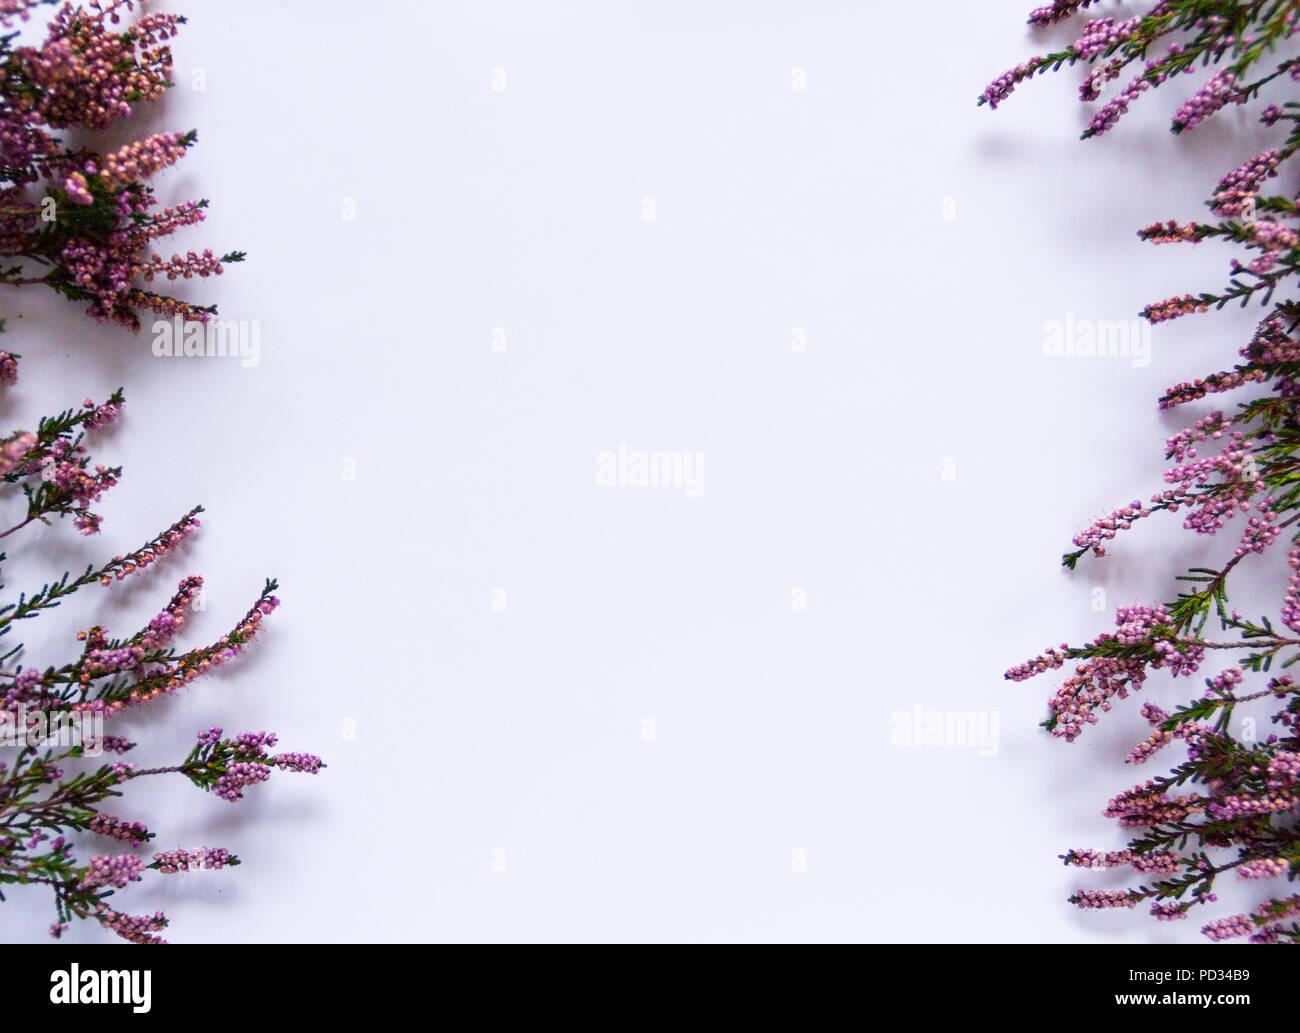 Purple autumn heathers (erica, calluna) in 2 rows on white background piece of paper. - Stock Image